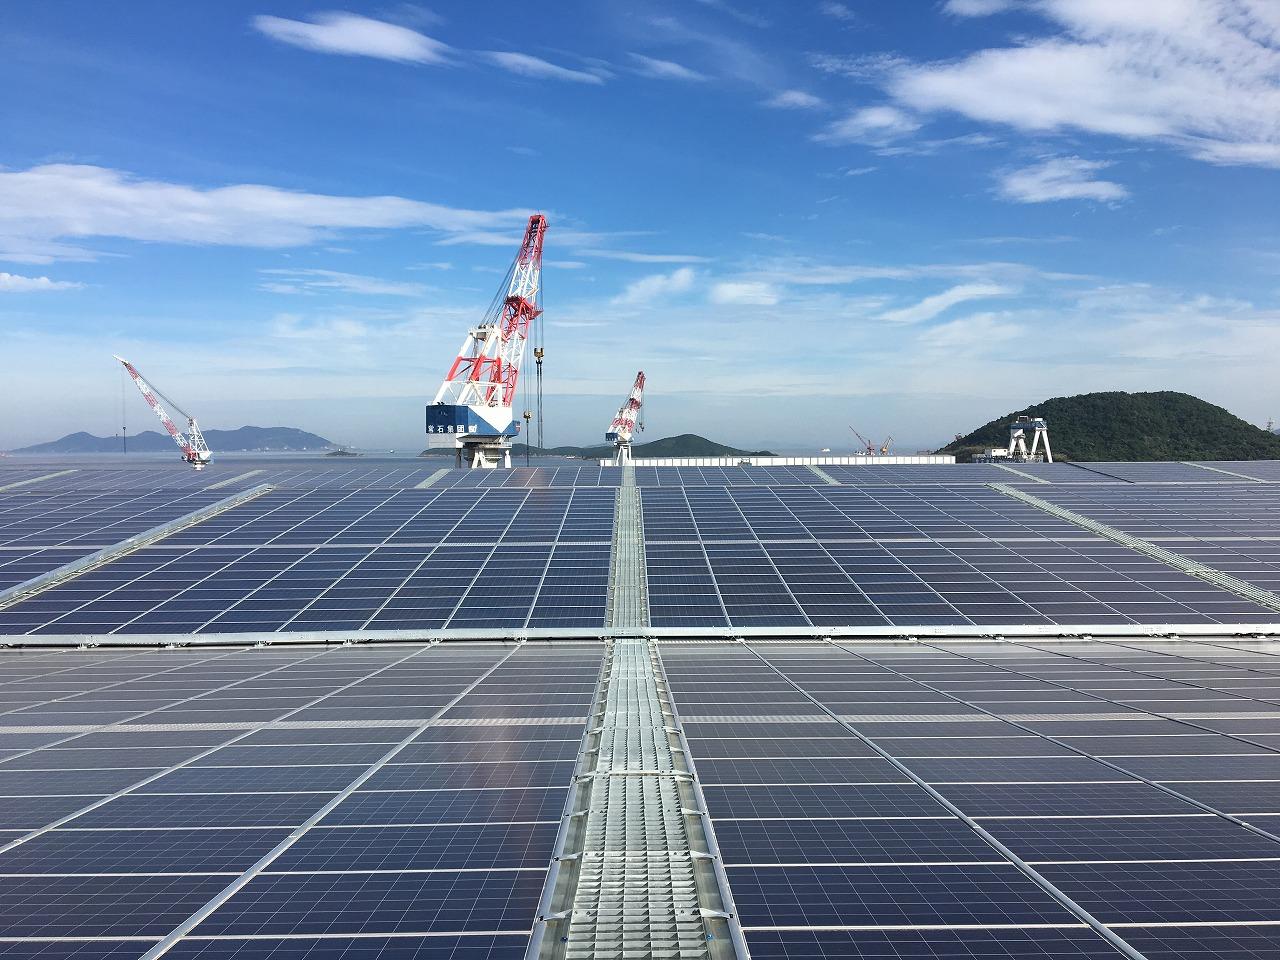 72,000 solar panels